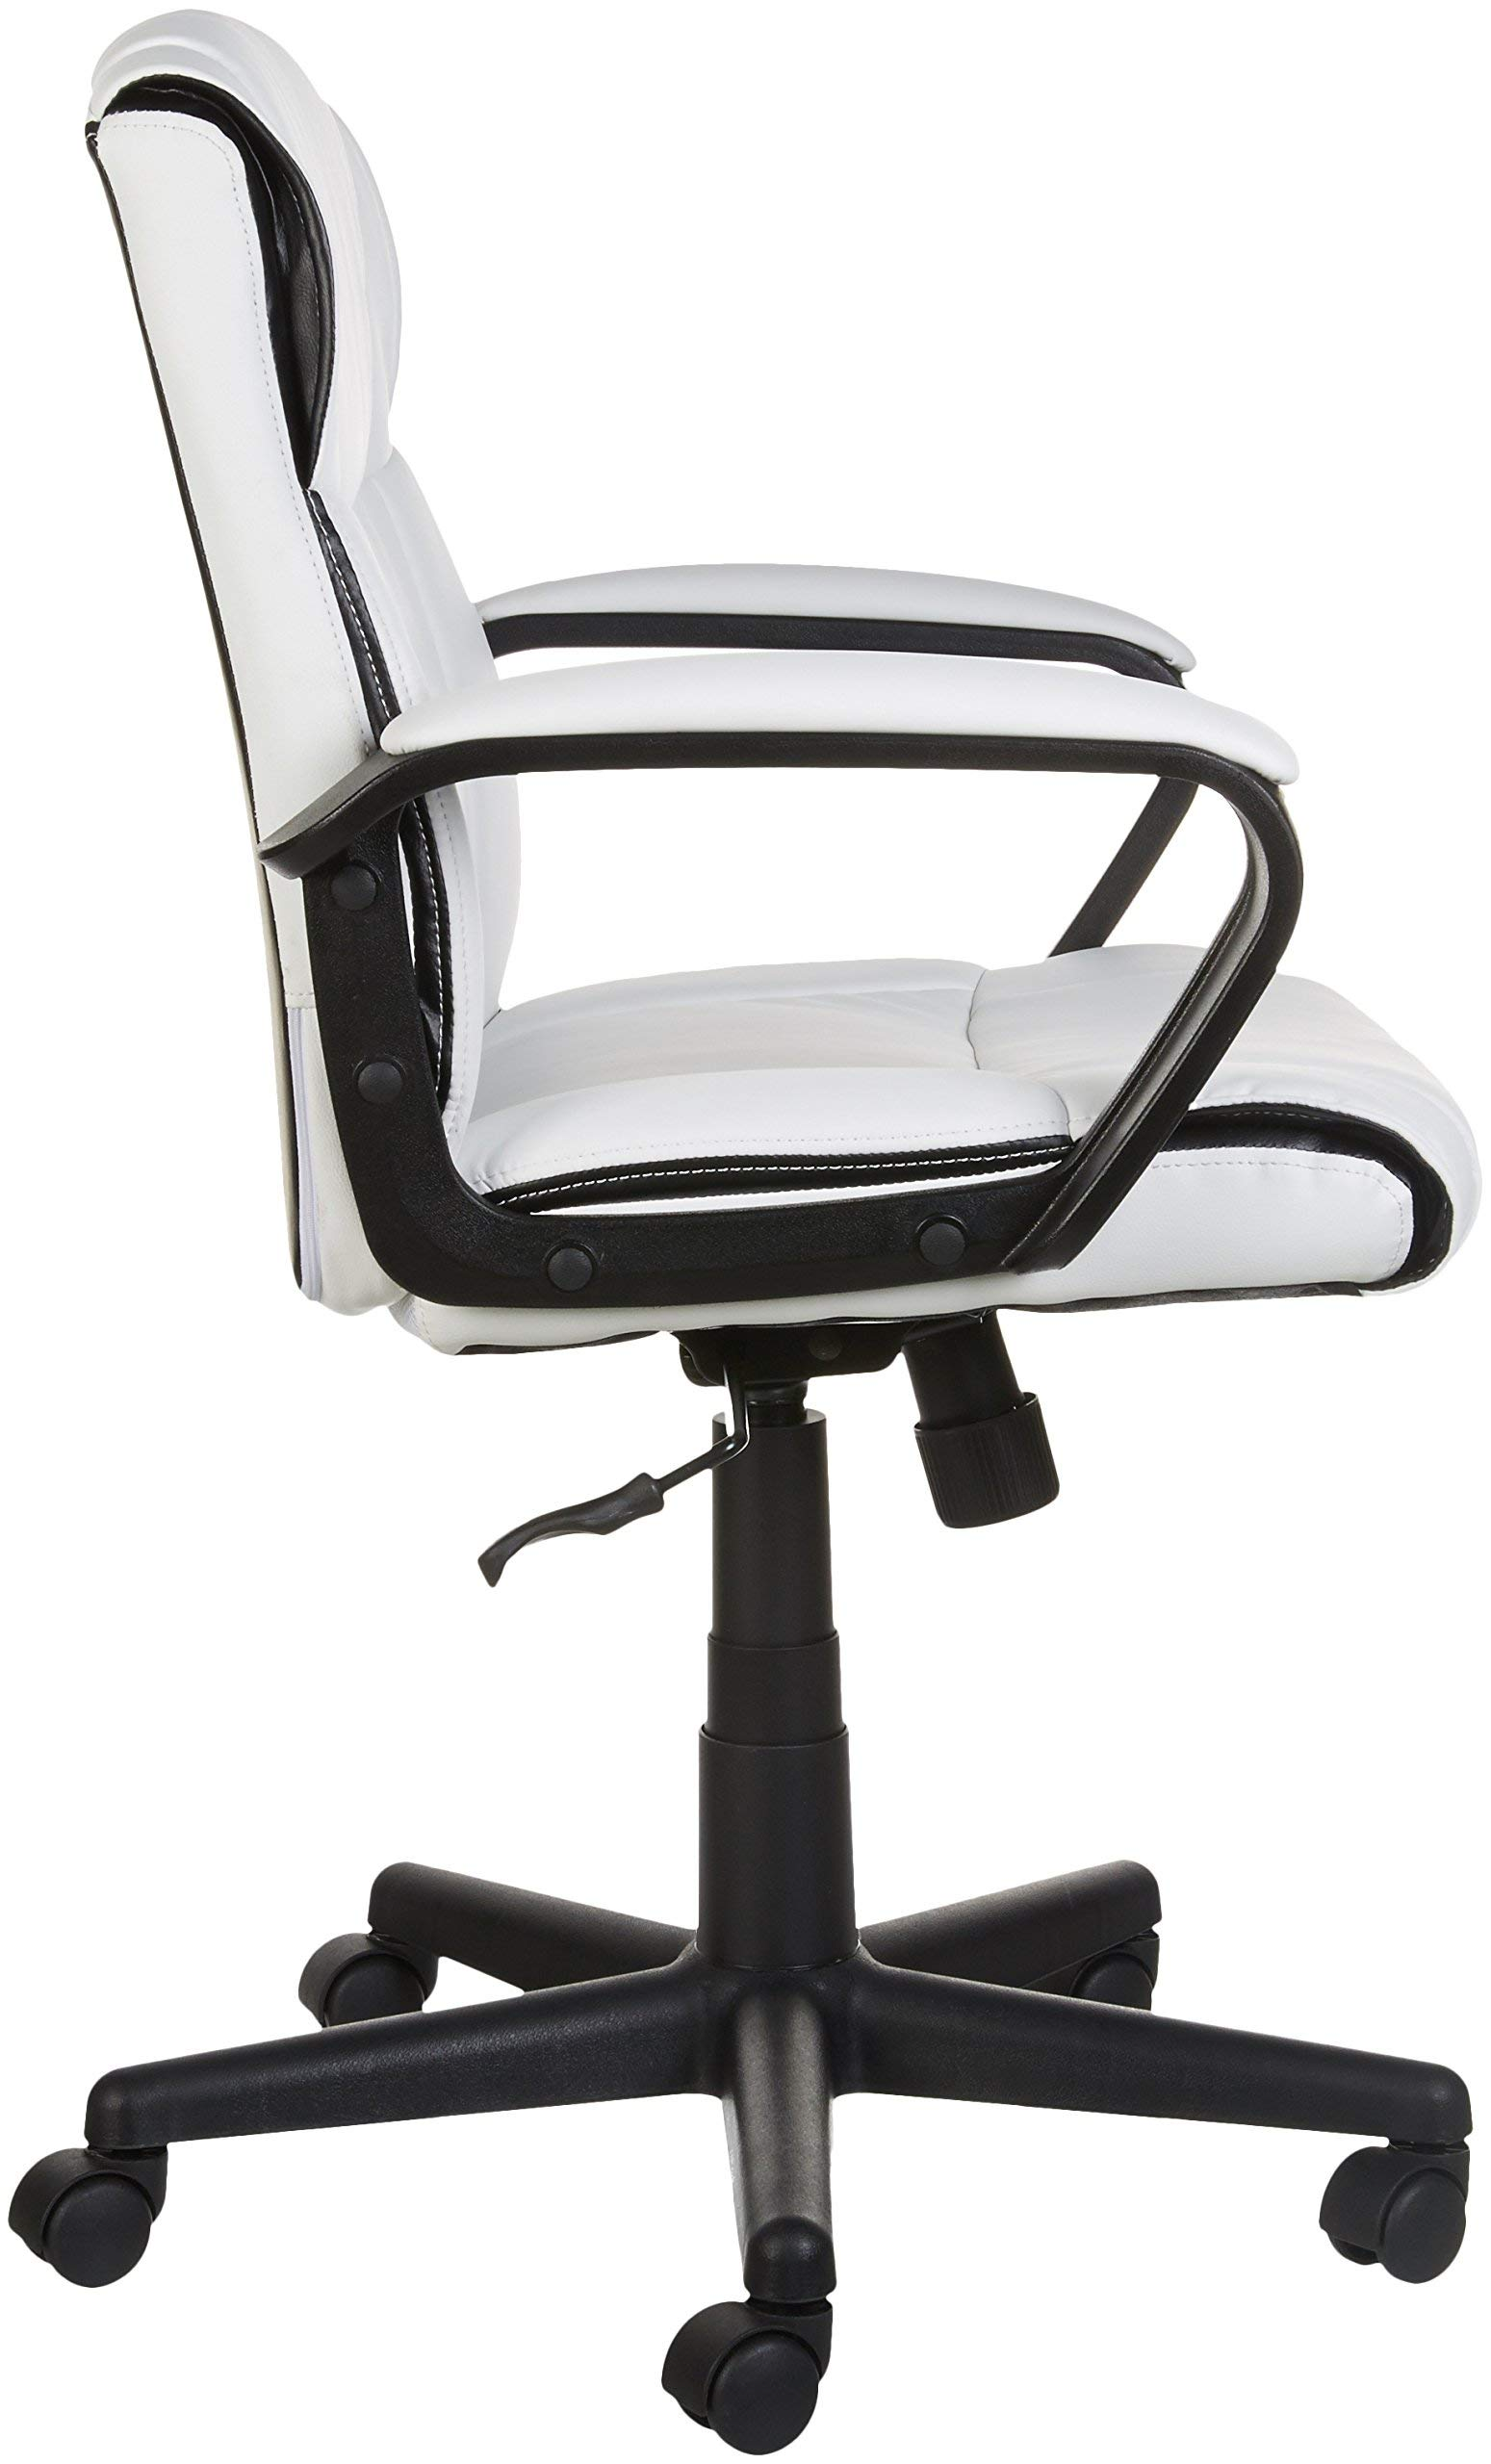 AmazonBasics Classic Leather-Padded Mid-Back Office Chair with Armrest - White by AmazonBasics (Image #5)